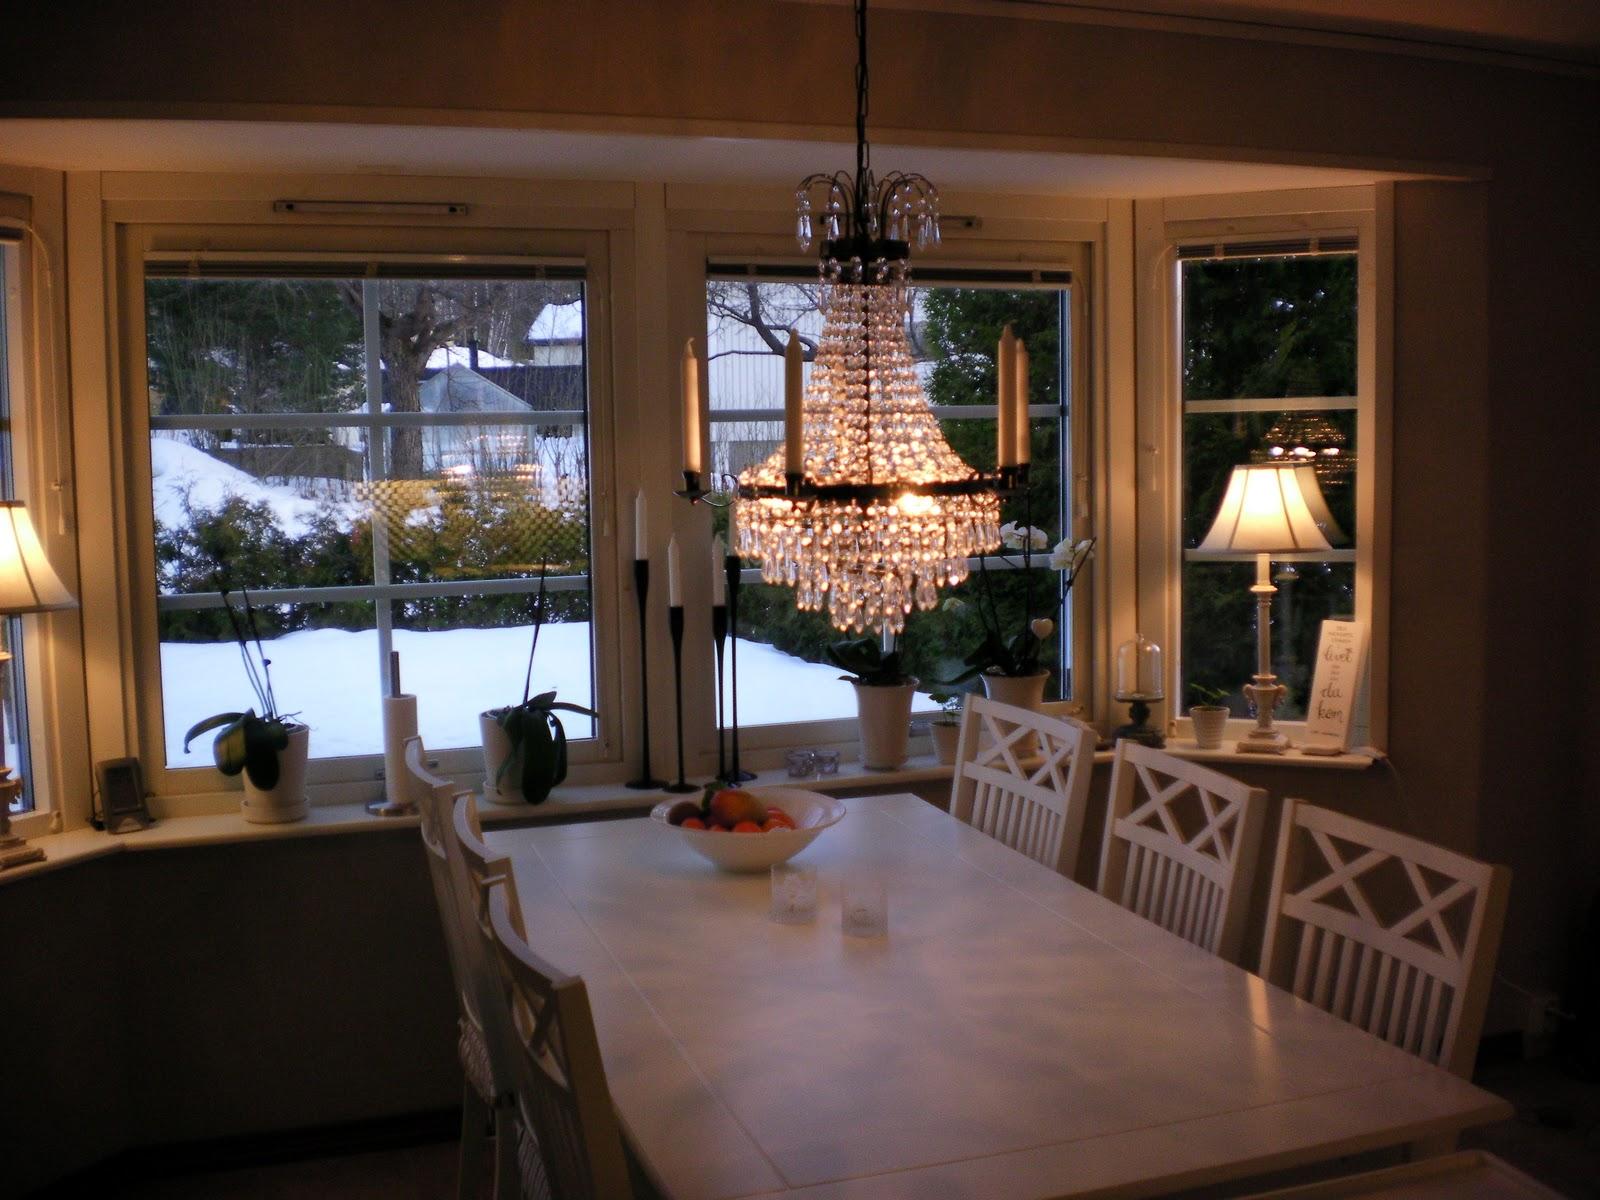 Svart Kokslampa : Min ljusa vardag Vor nya kokslampa